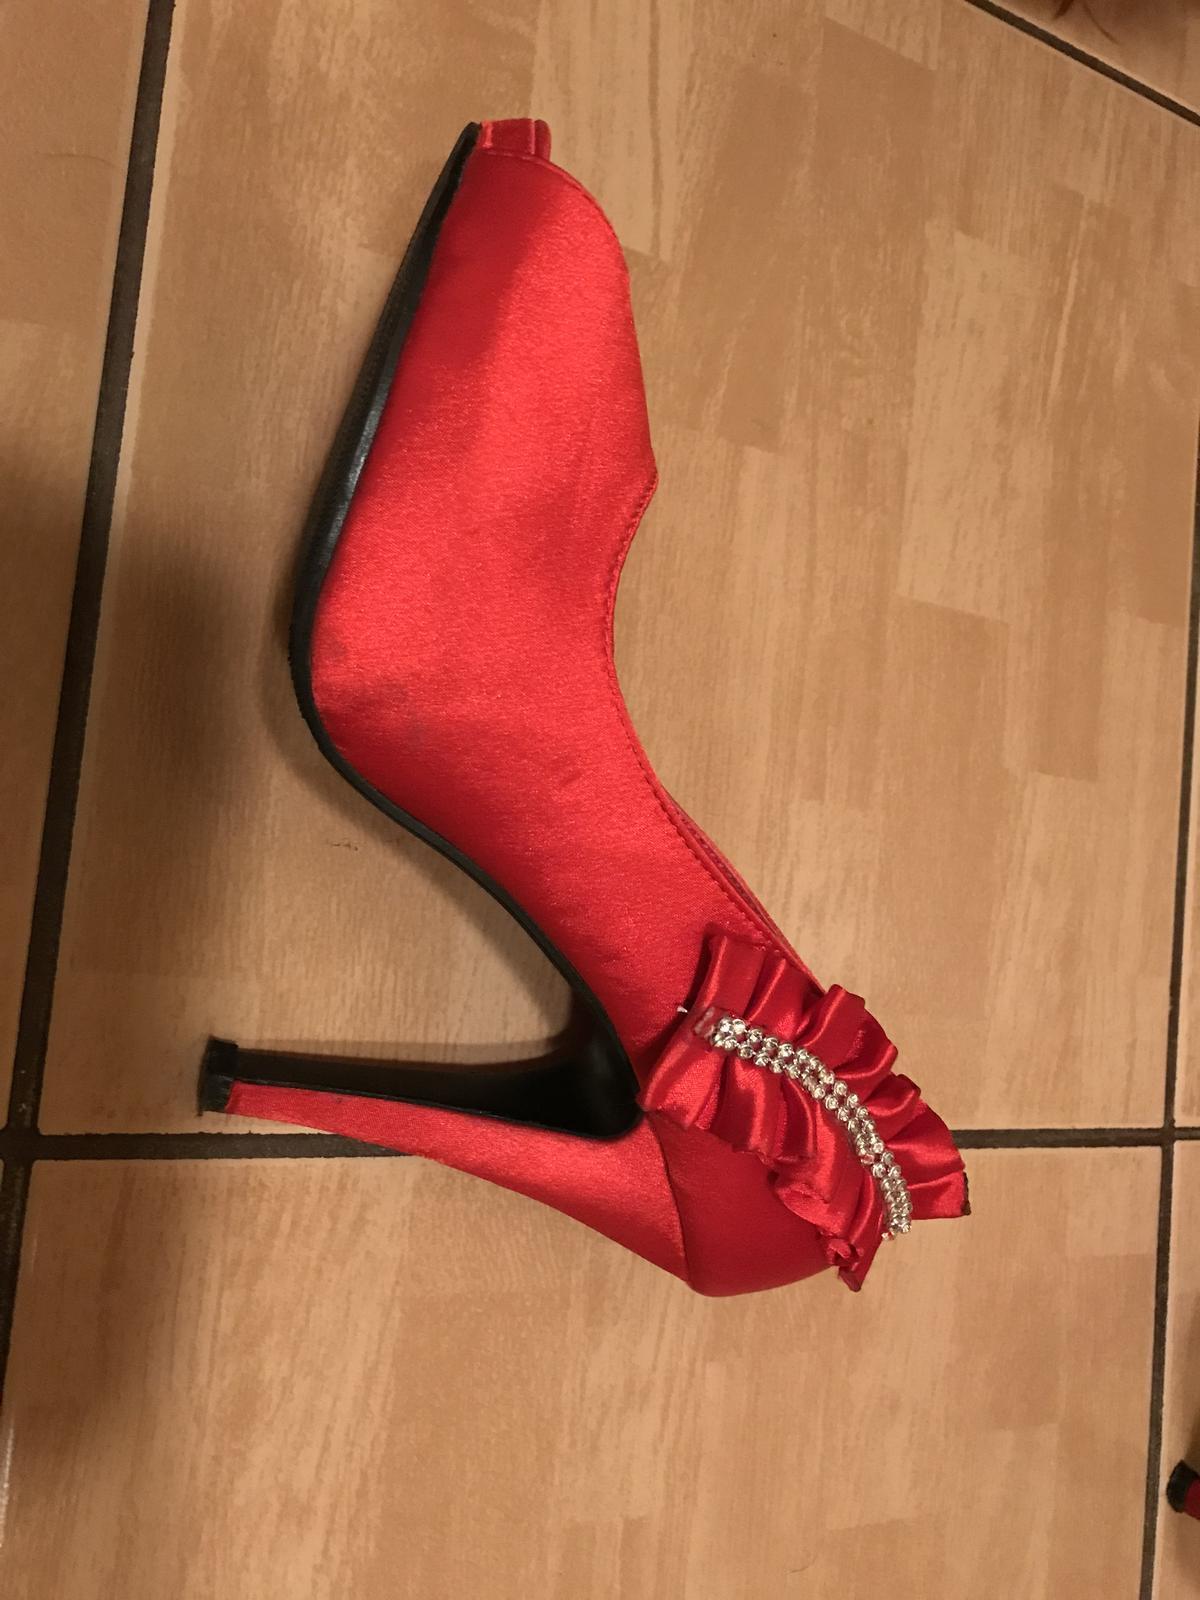 Topánky na redovy tanec - Obrázok č. 1